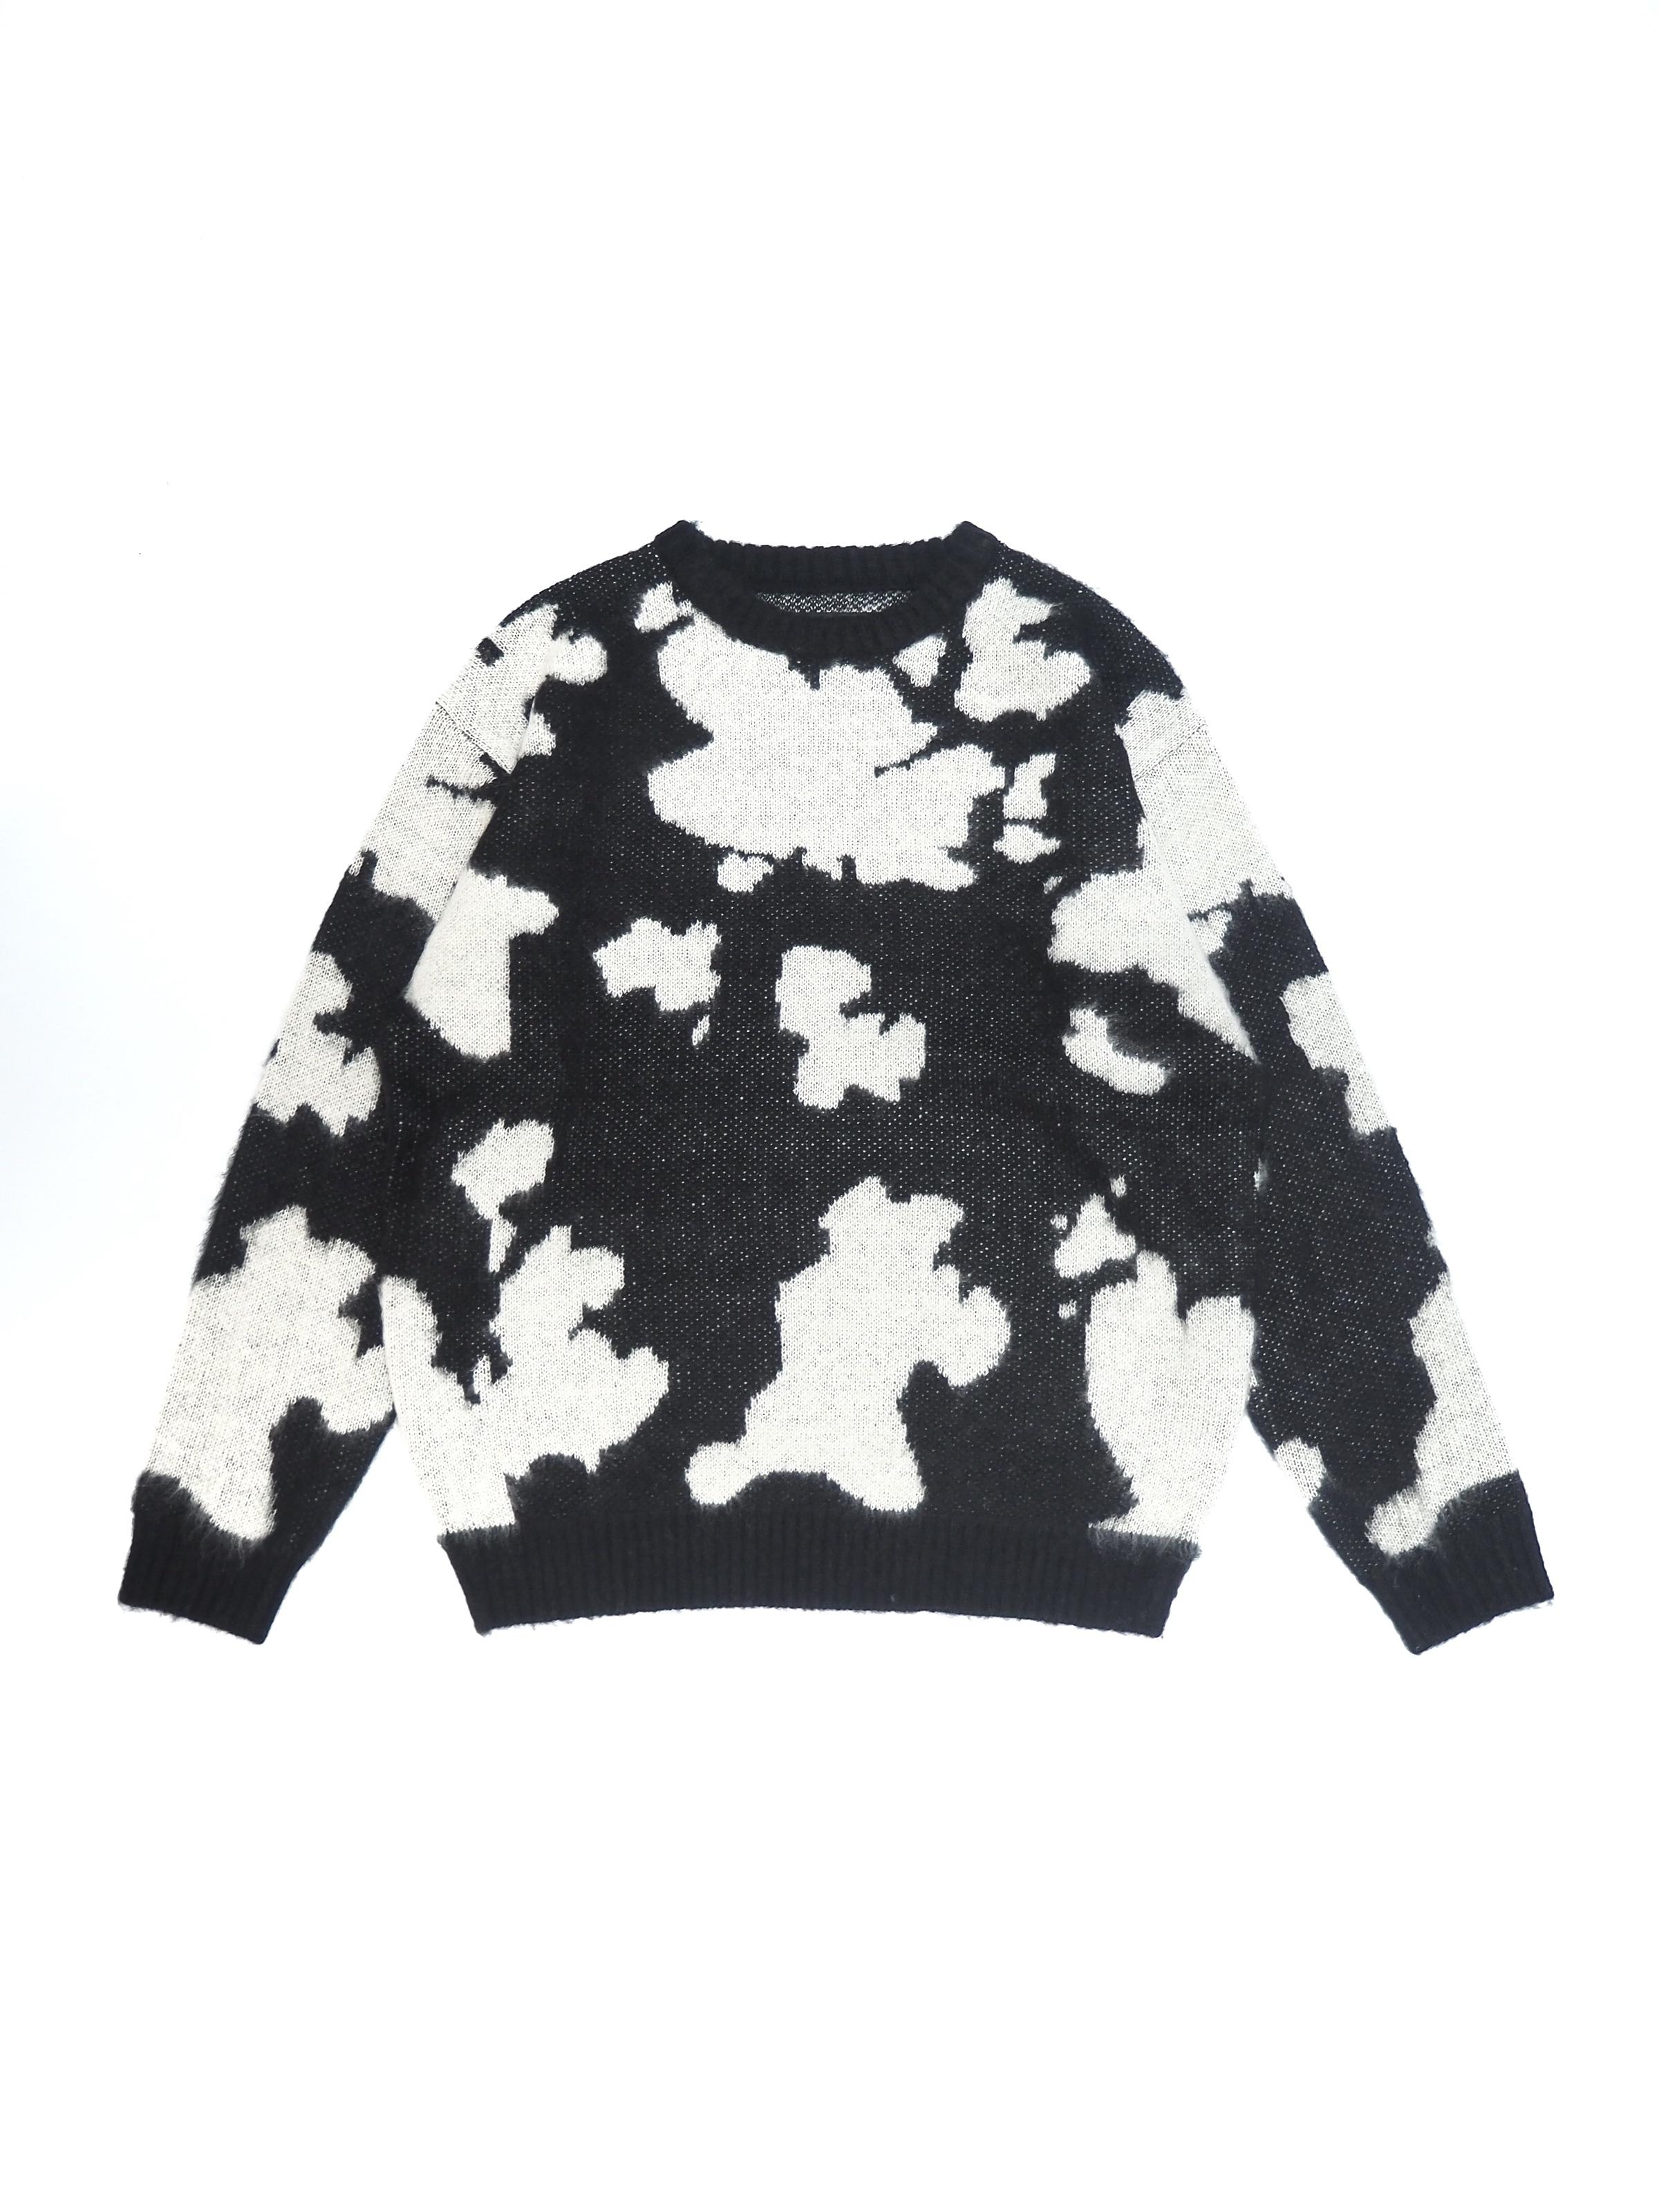 【TOWN CRAFT】70s jacquard crew-neck sweater